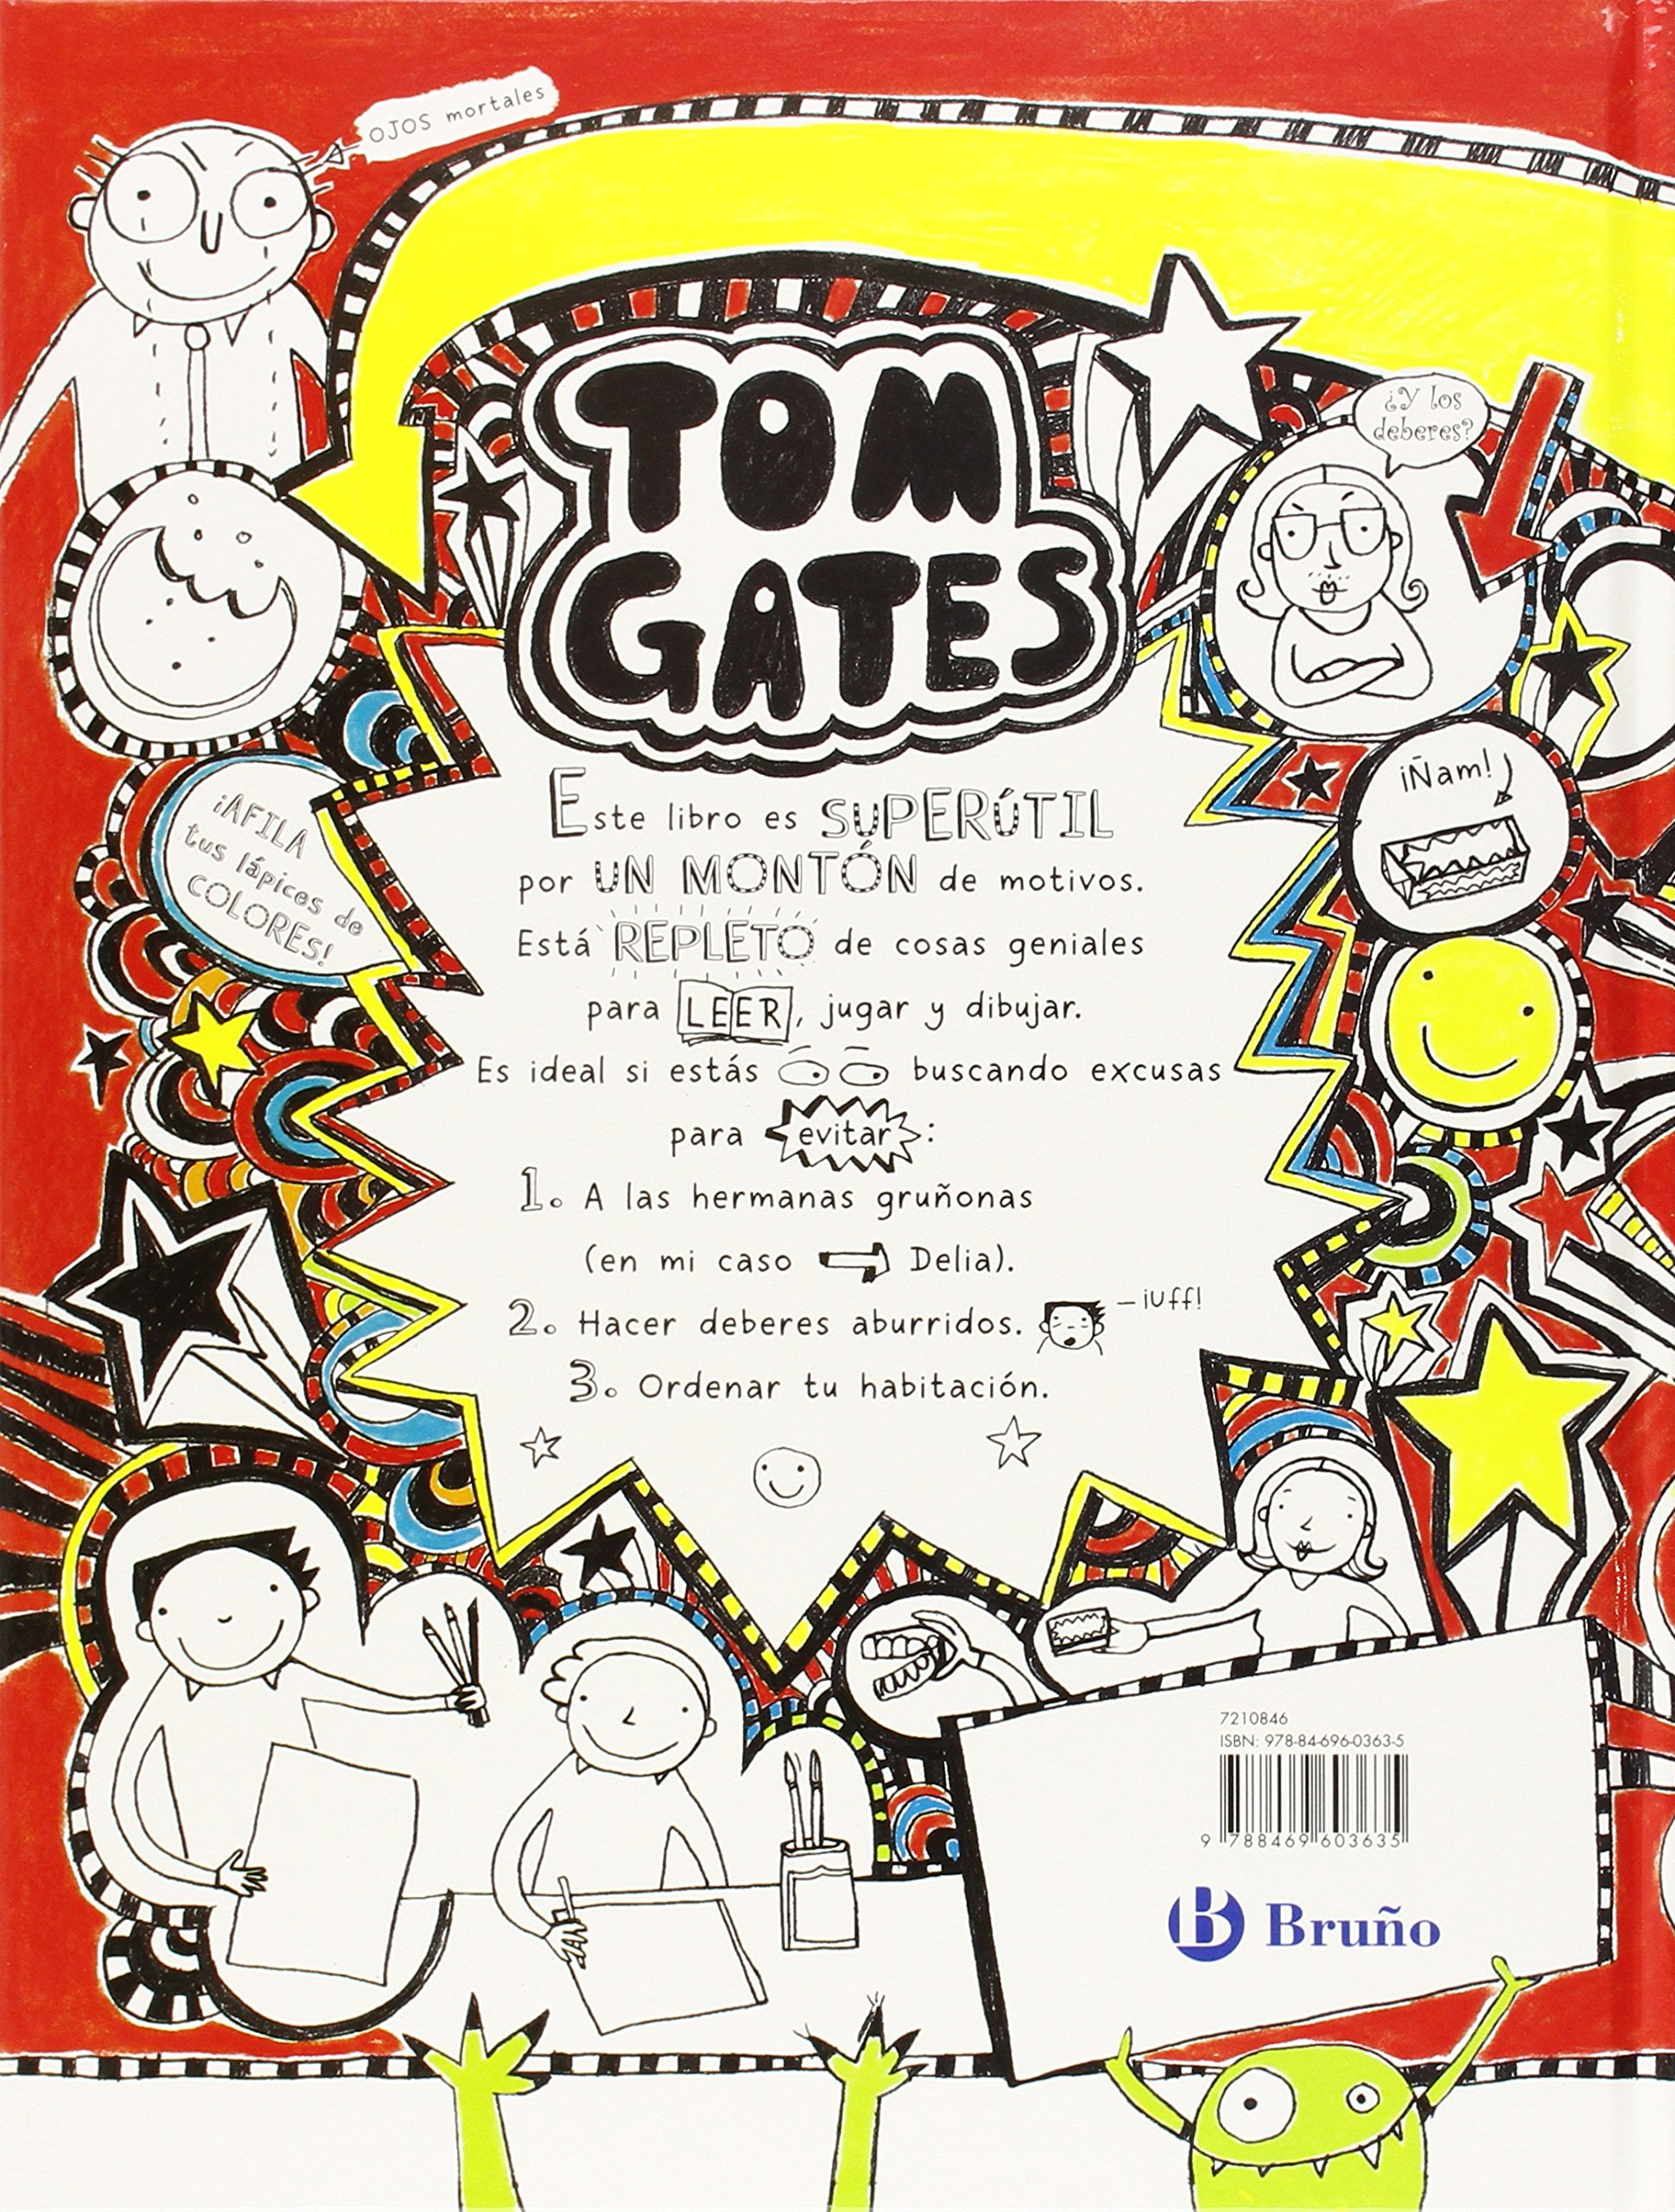 Mega álbum genial Castellano - A Partir De 10 Años - Personajes Y Series - Tom  Gates: Amazon.de: Liz Pichon, Daniel Cortés Coronas: Fremdsprachige Bücher